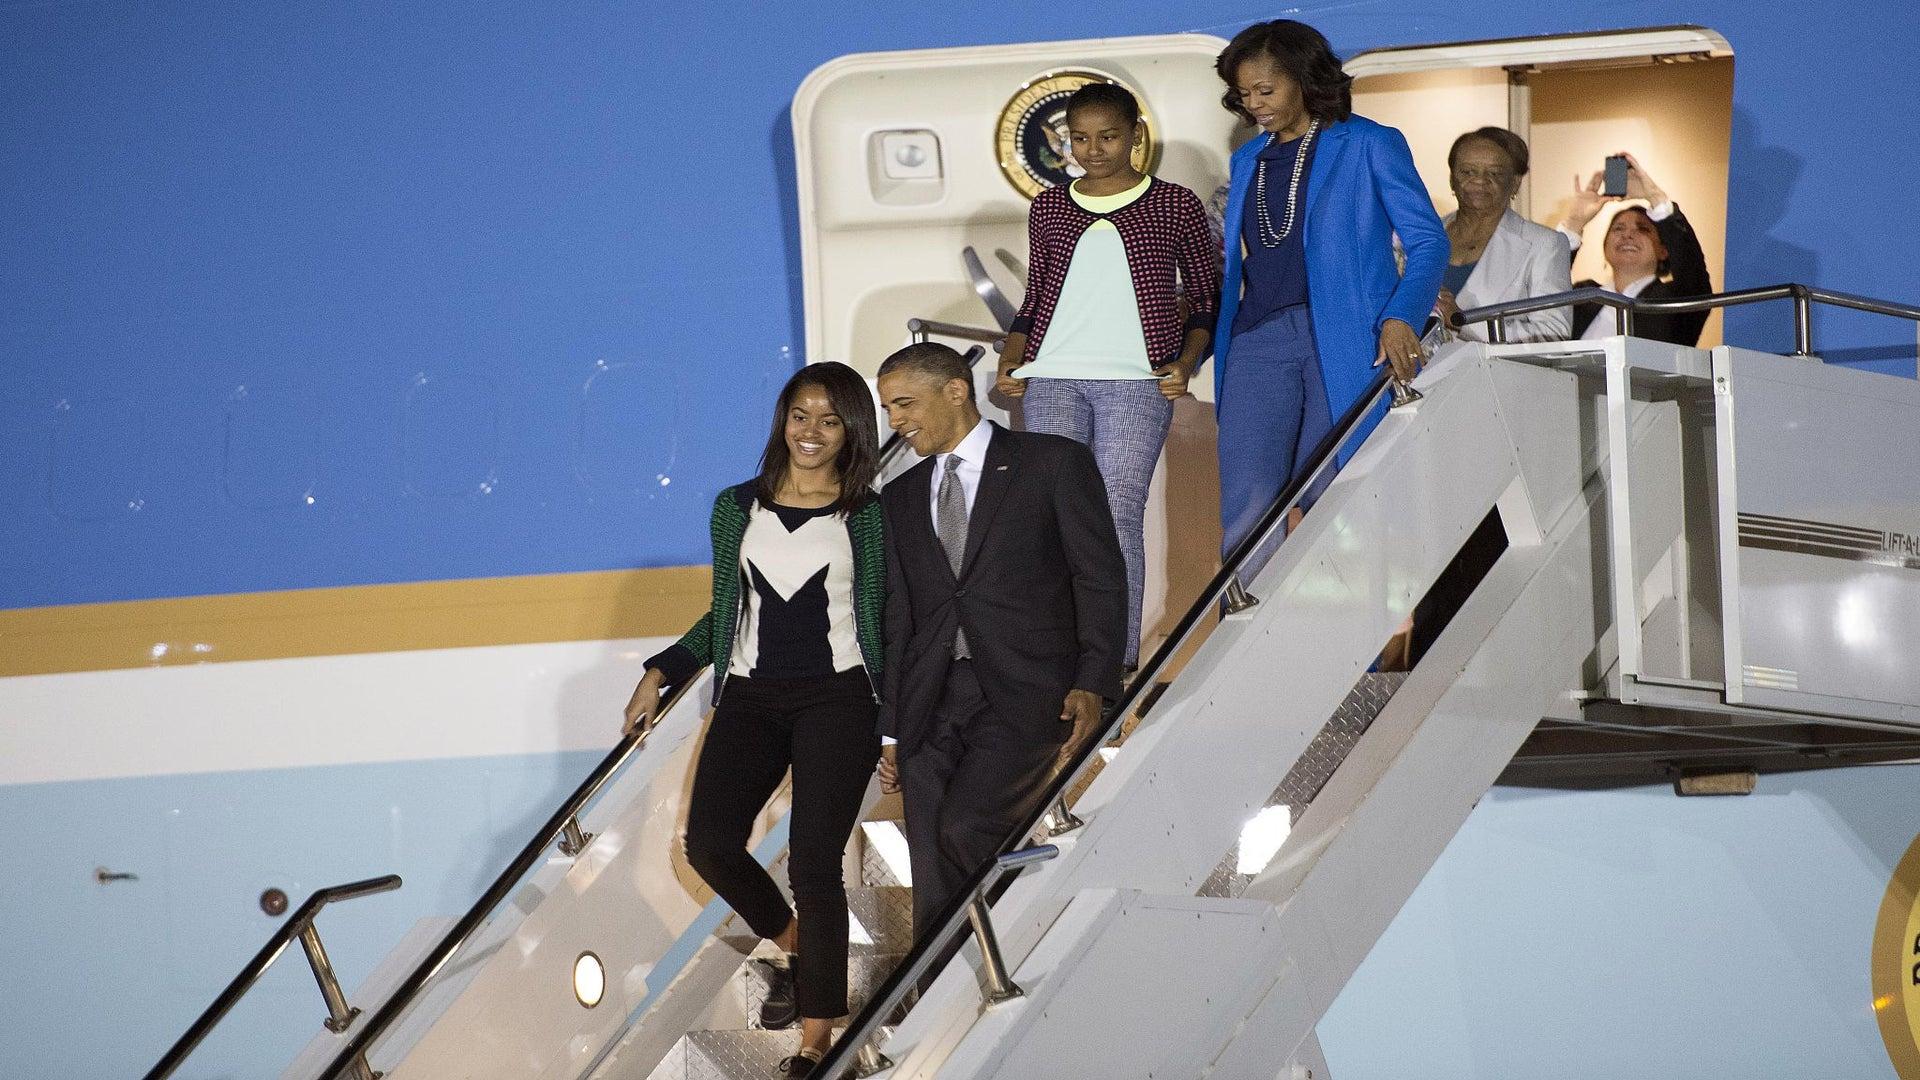 Malia and Sasha Obama Get Briefed Before International Trips